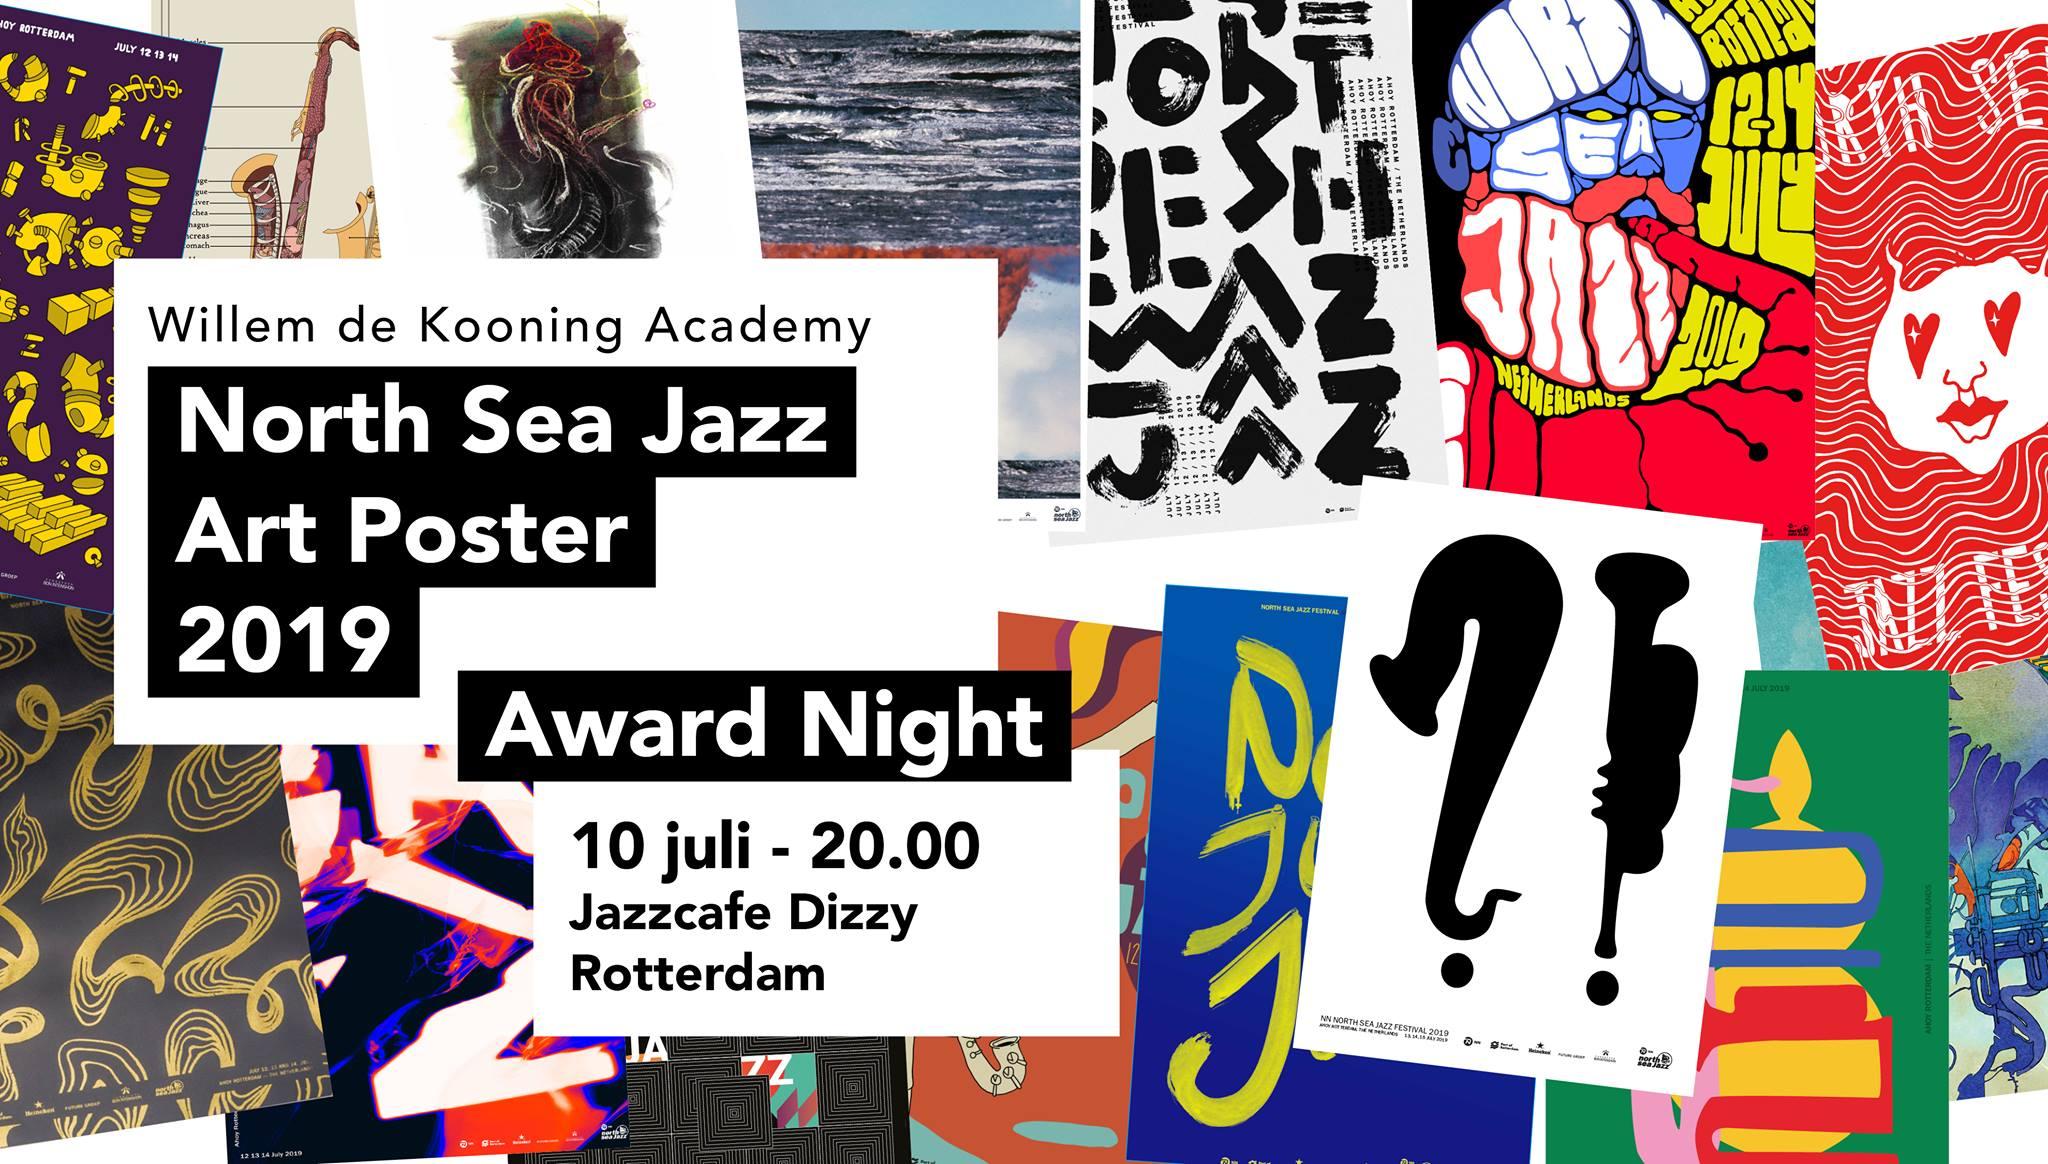 North Sea Jazz Art Poster Award Night